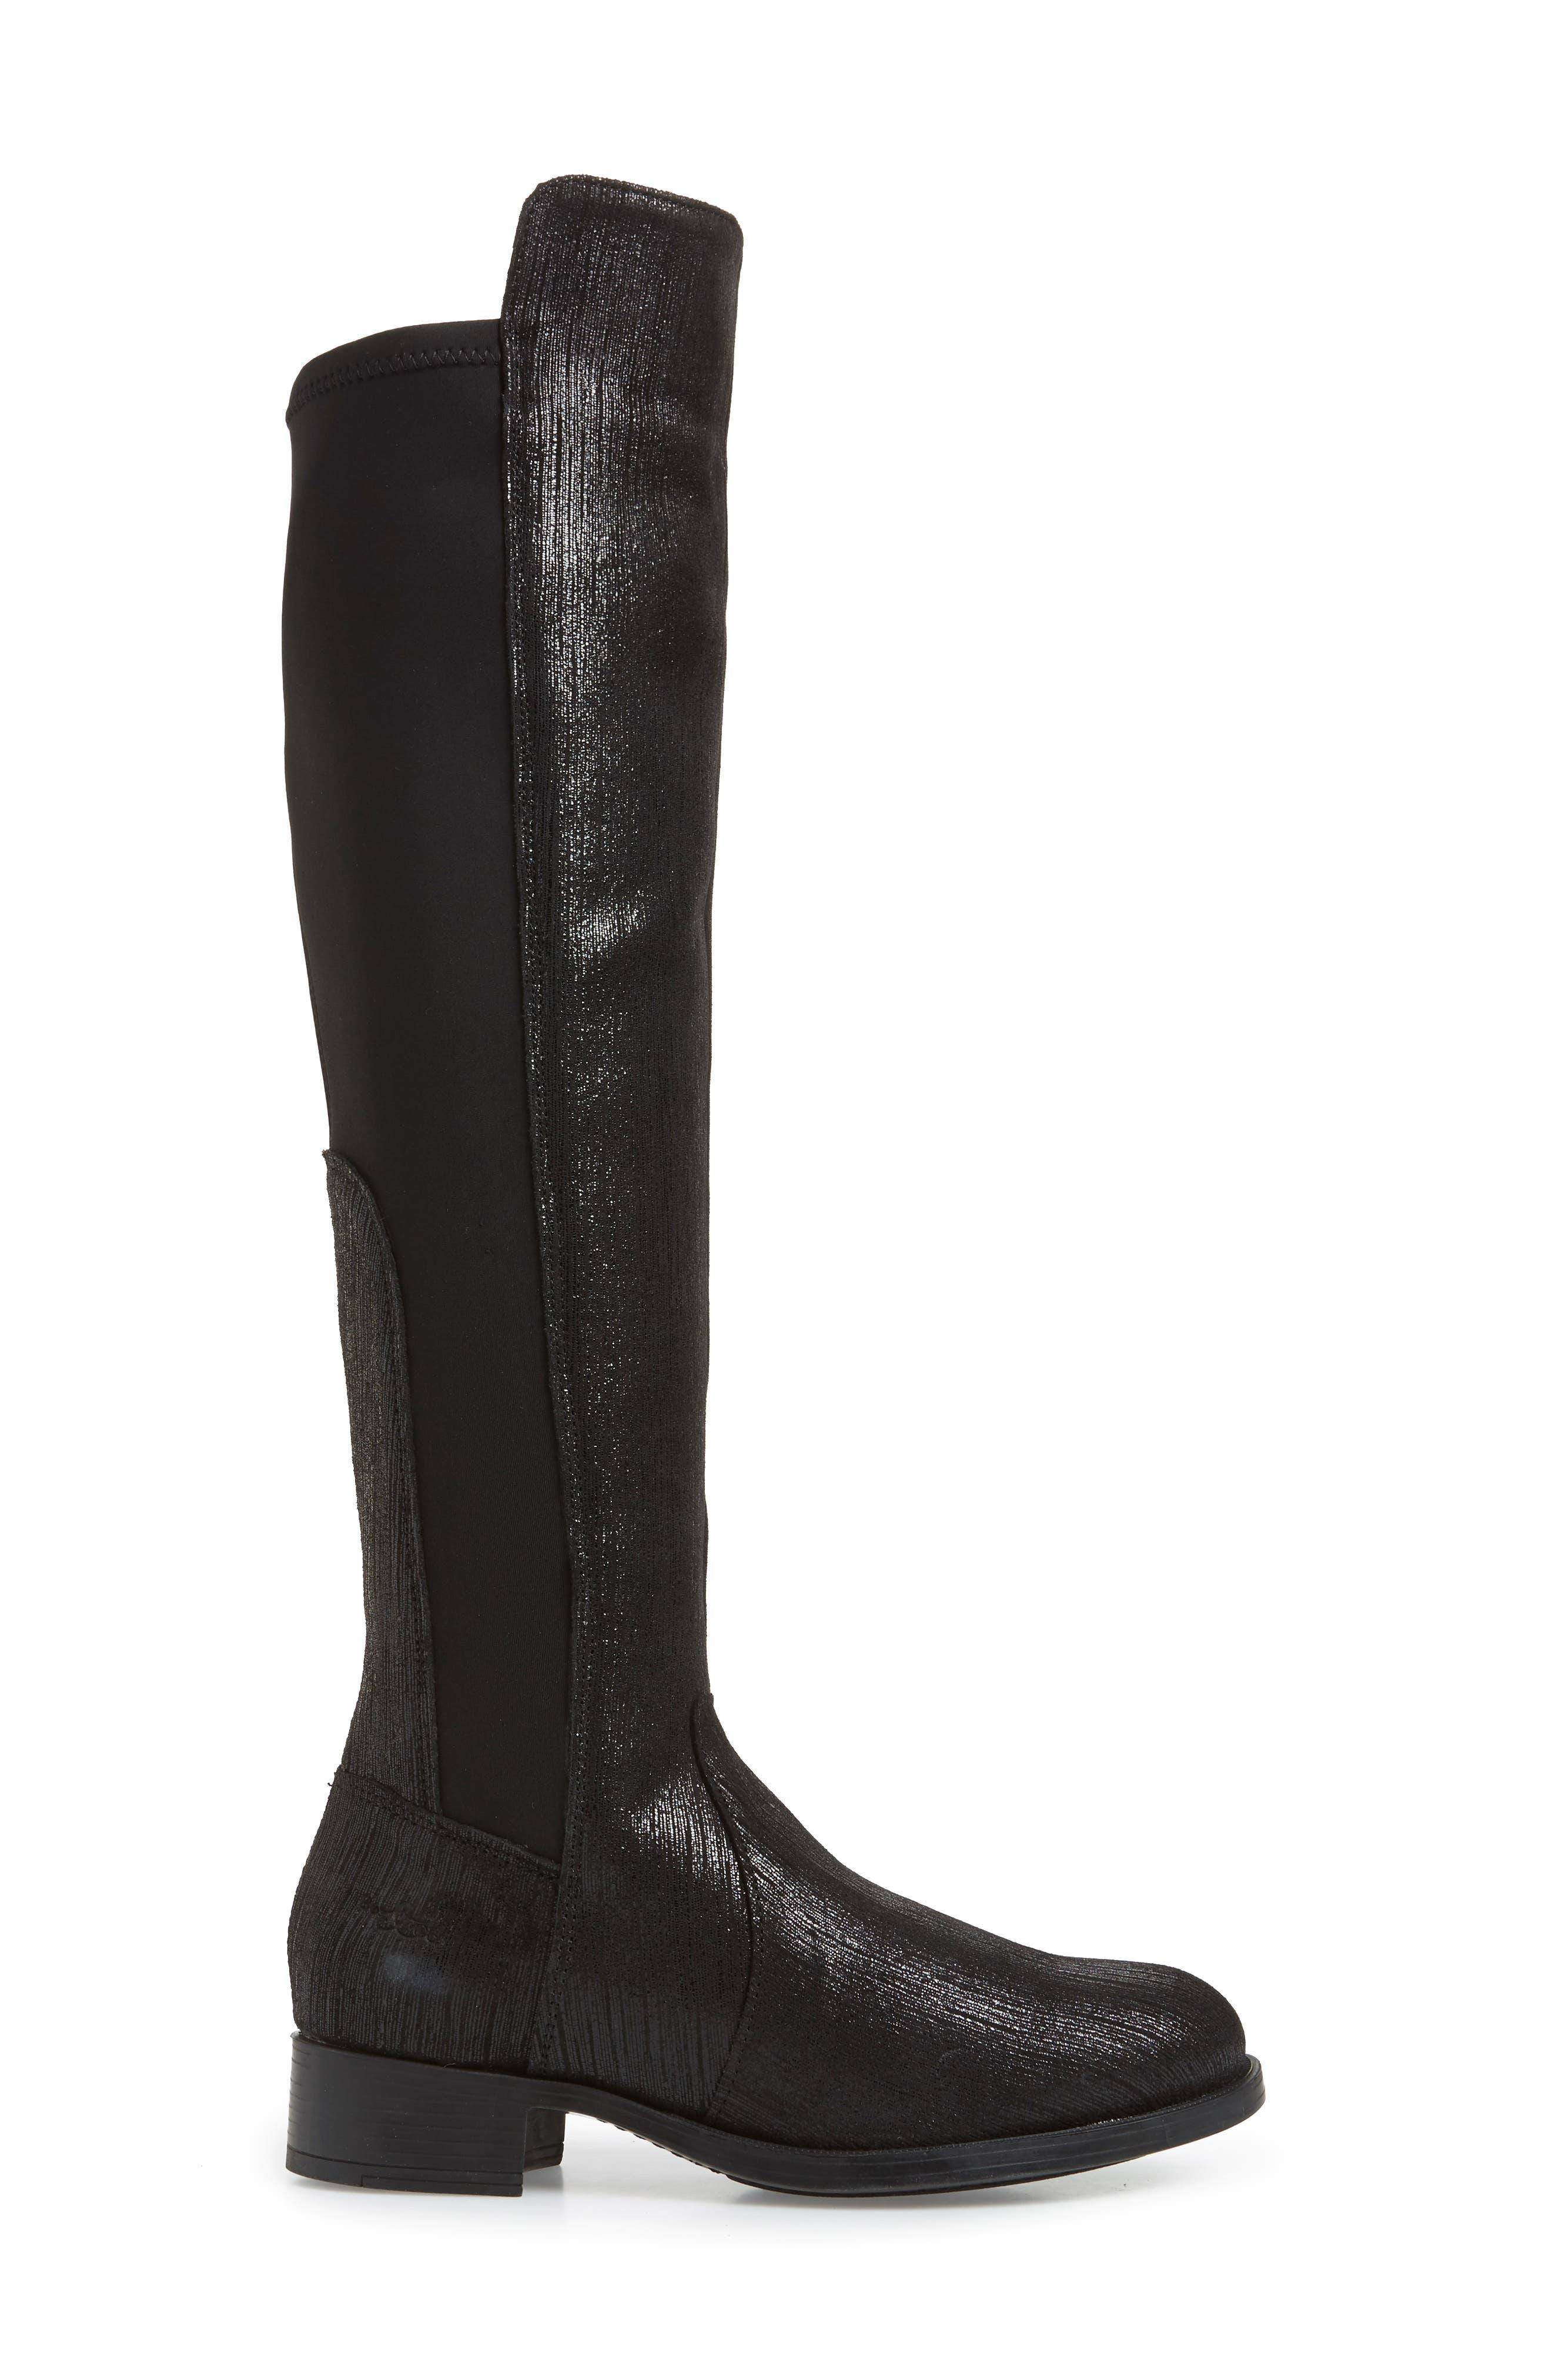 Bunt Waterproof Over the Knee Boot,                             Alternate thumbnail 4, color,                             Black Metal/ Lycra